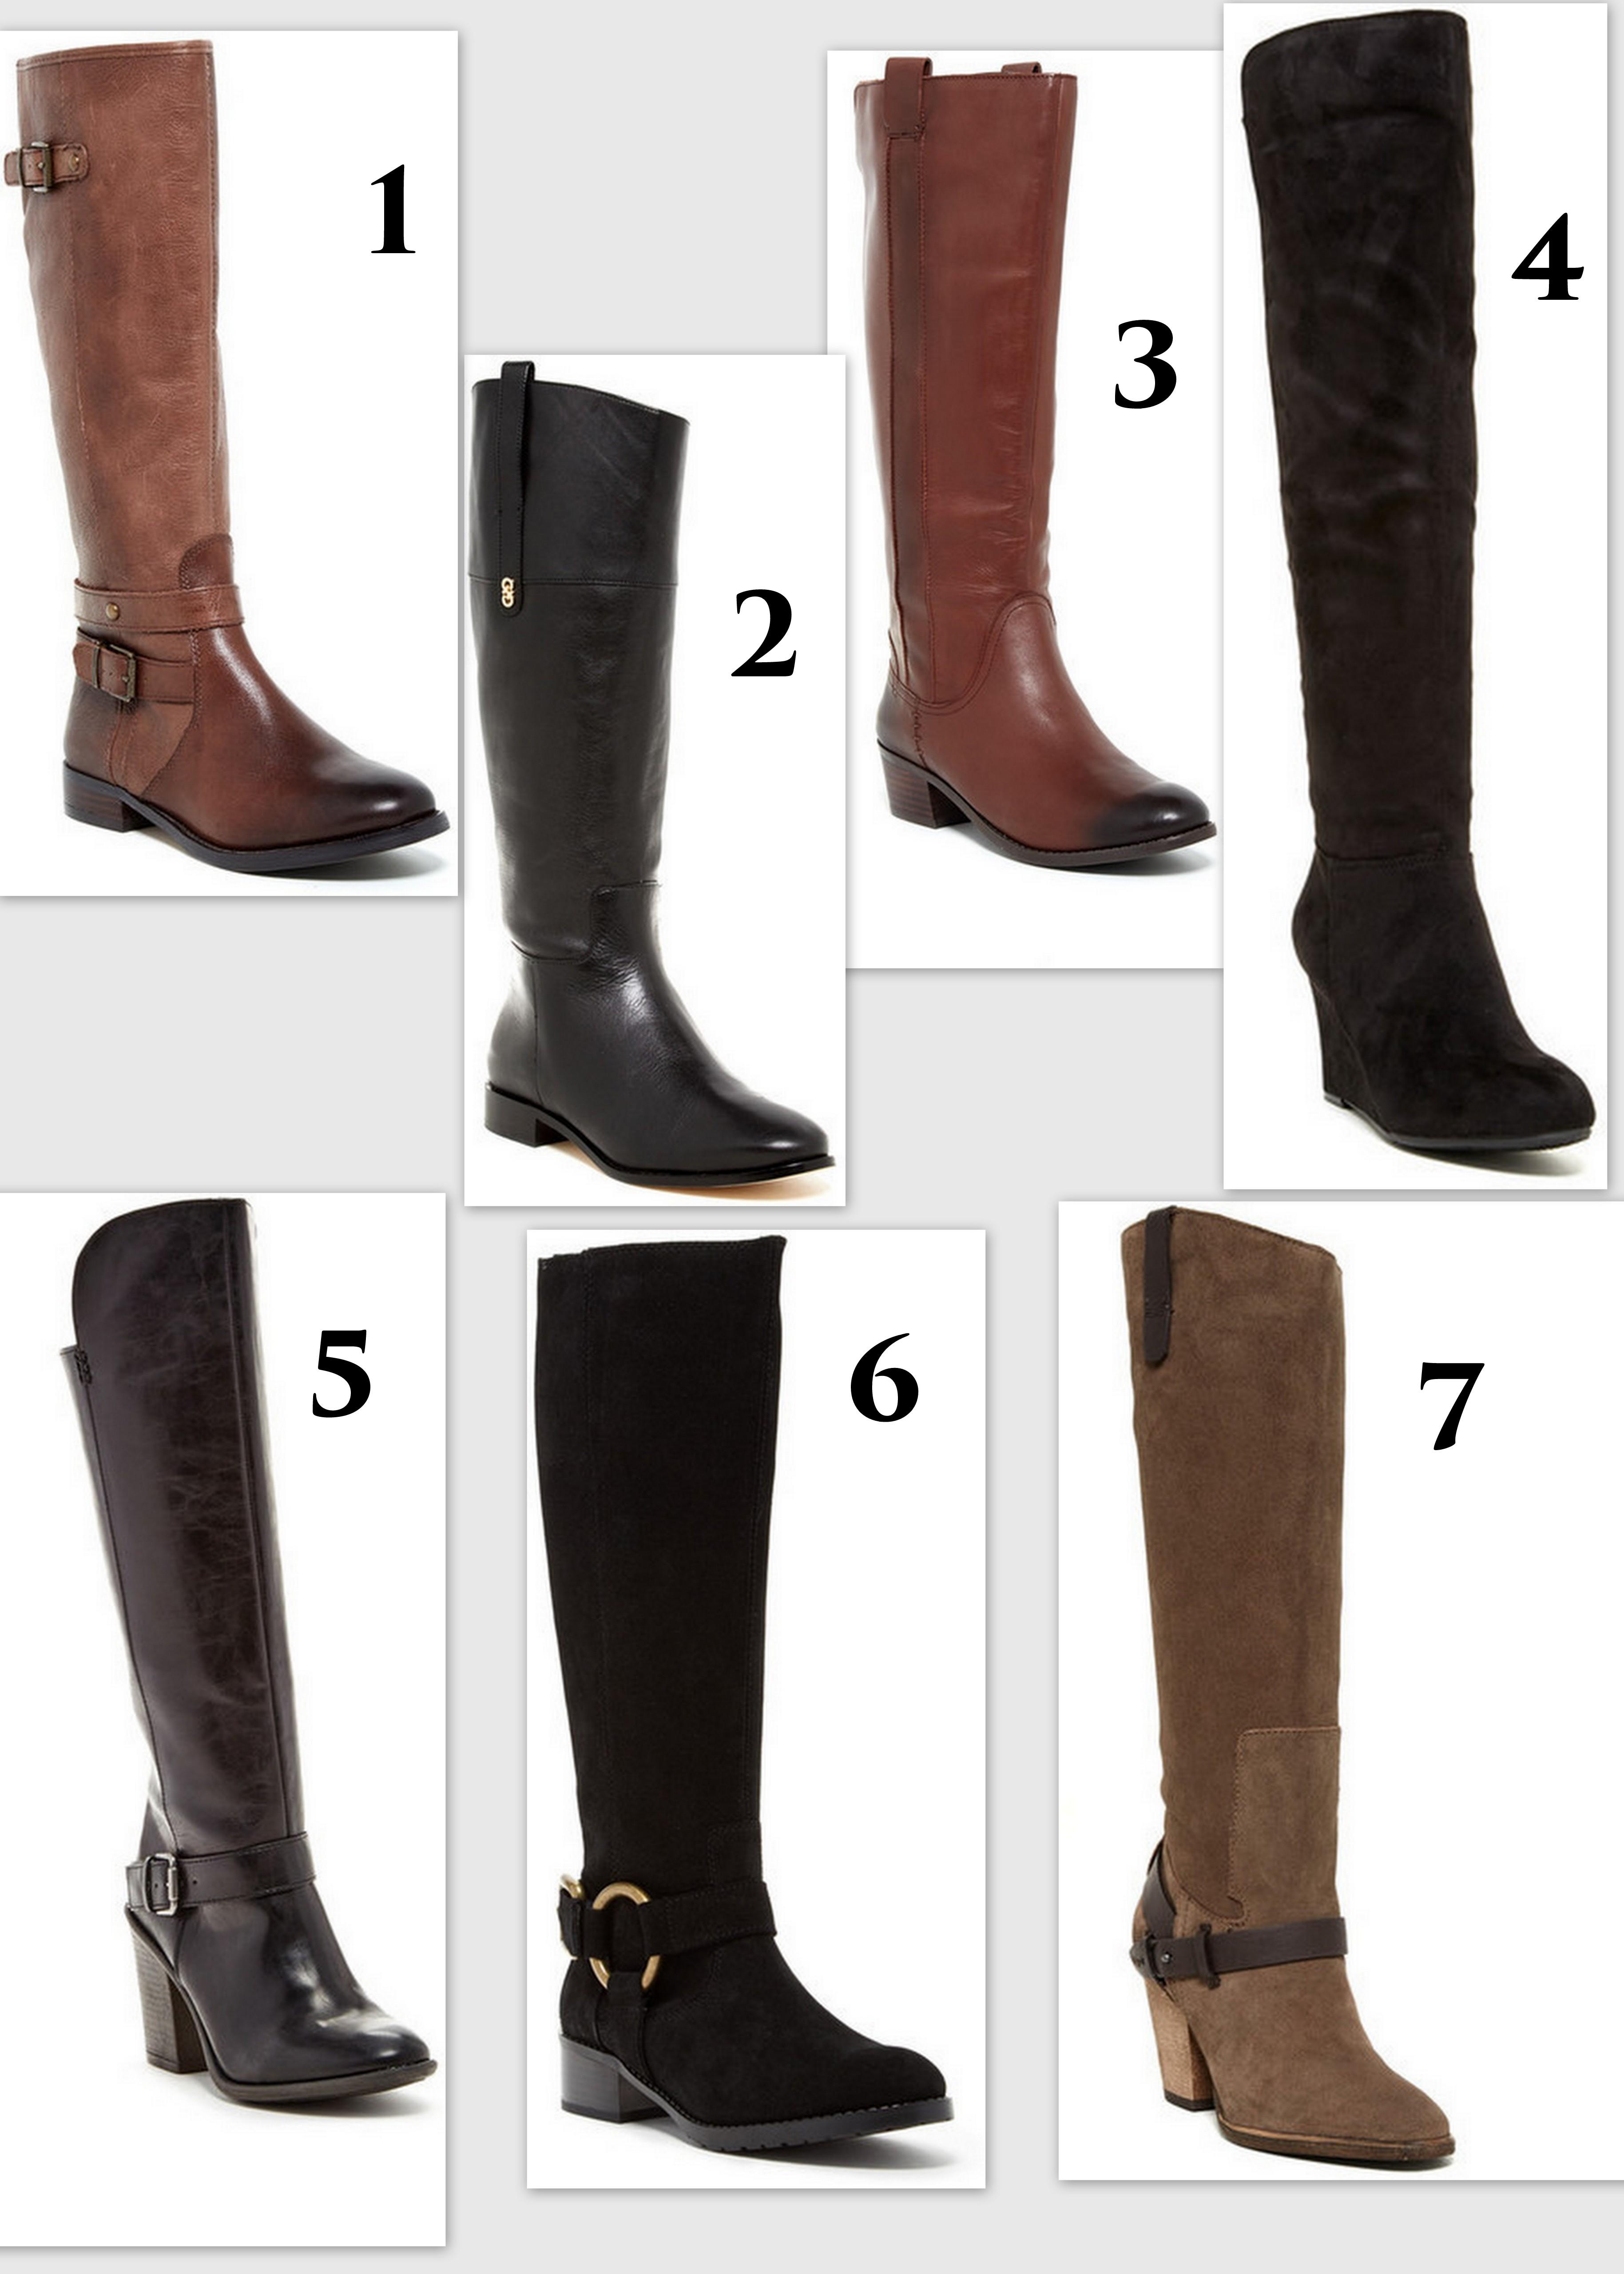 http www rusalka si rsx asp cid 99 shop nordstrom rack womens boots xi 1 xc 26 pl pr 65 99 you 0